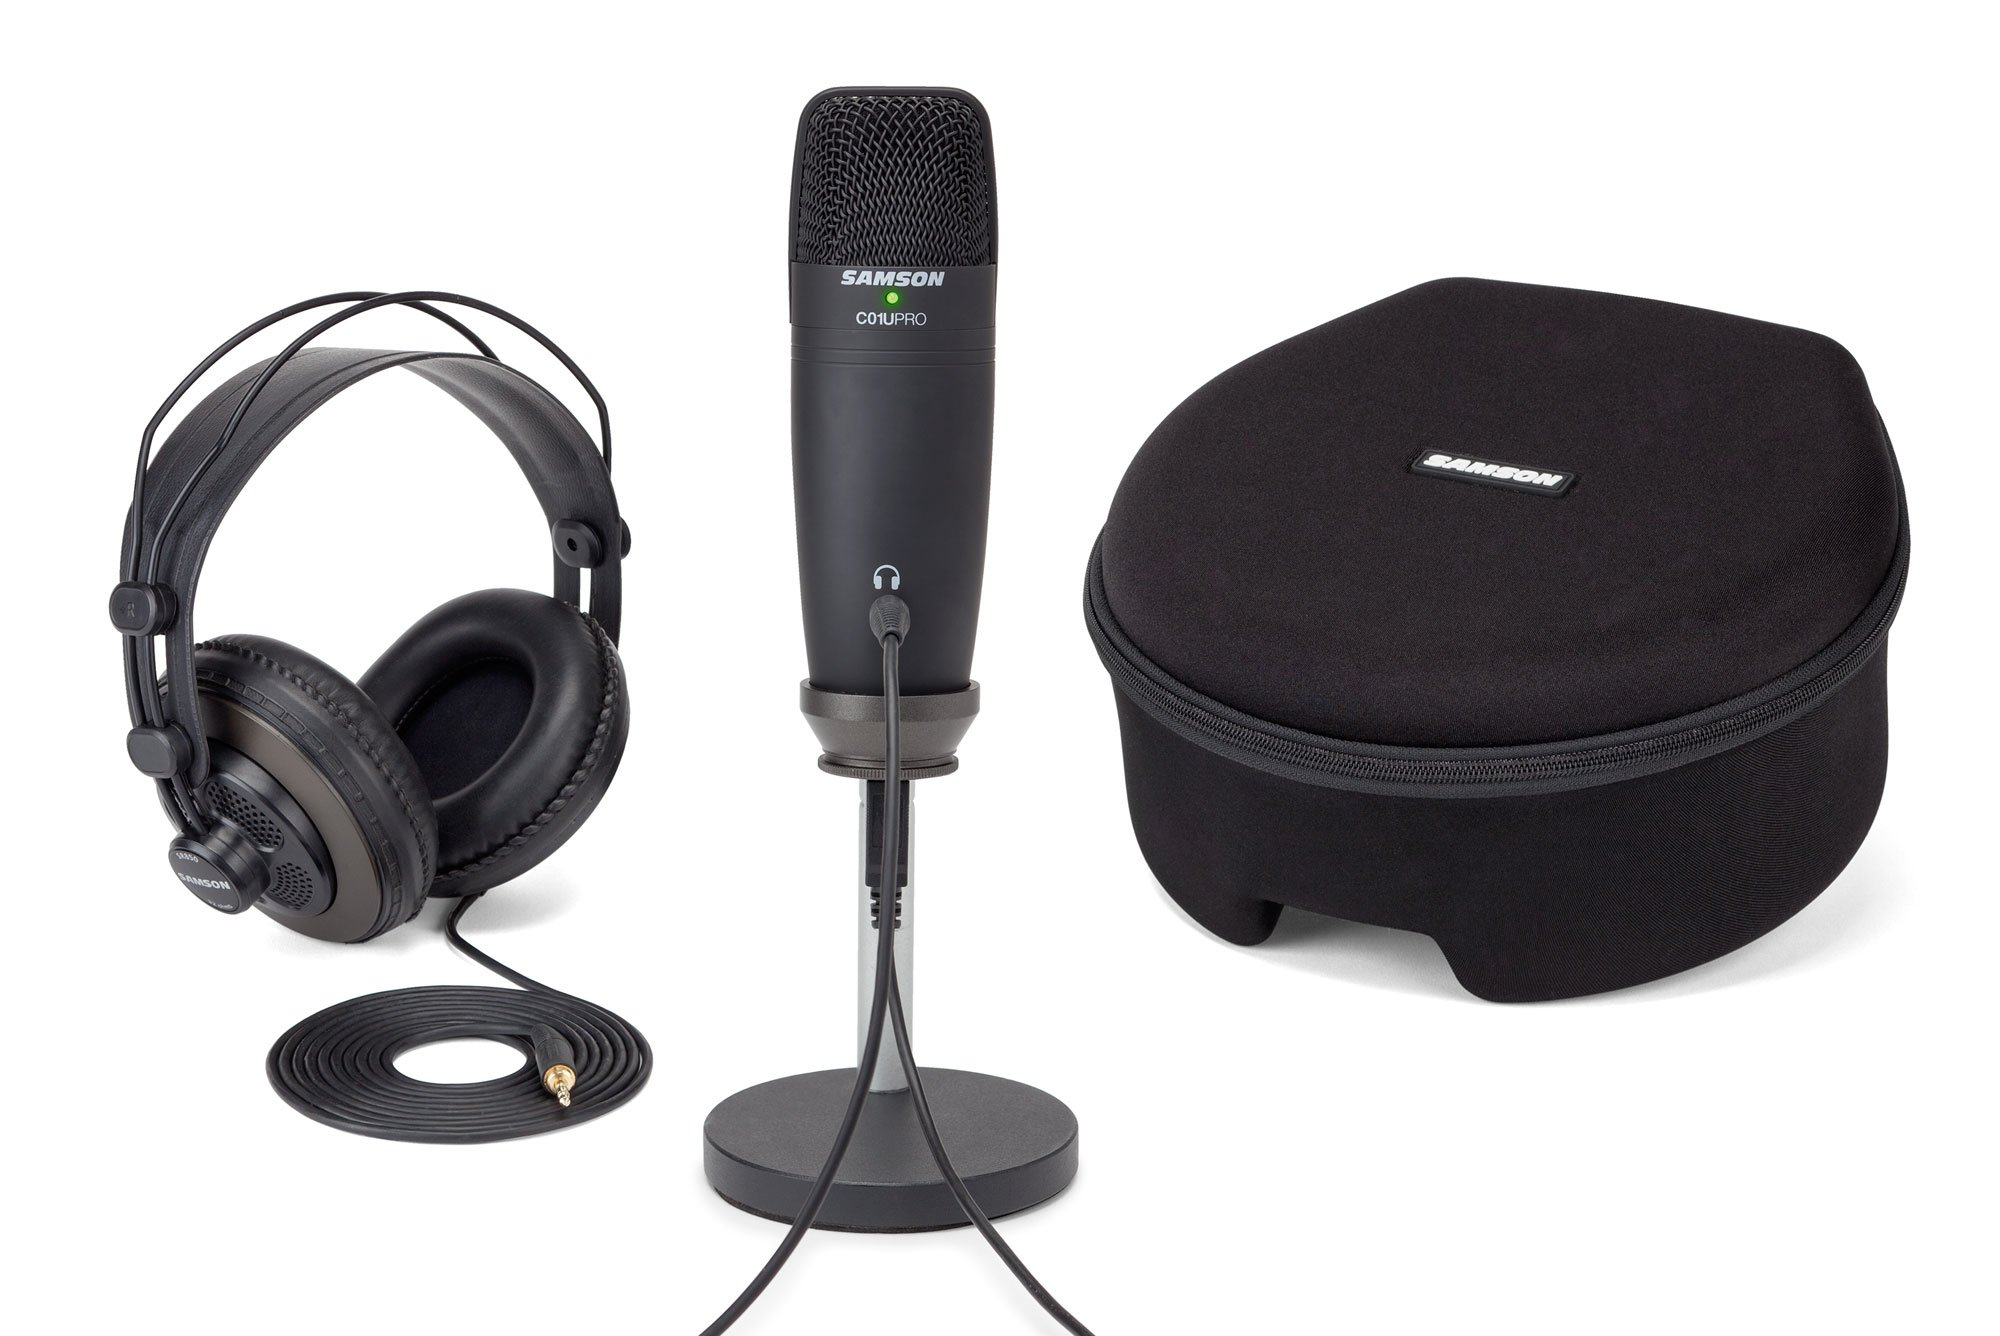 Samson C01U PRO Titanium PACK Digital Recording and Podcasting Pack with SR850 Studio Monitoring Headphones (Black)